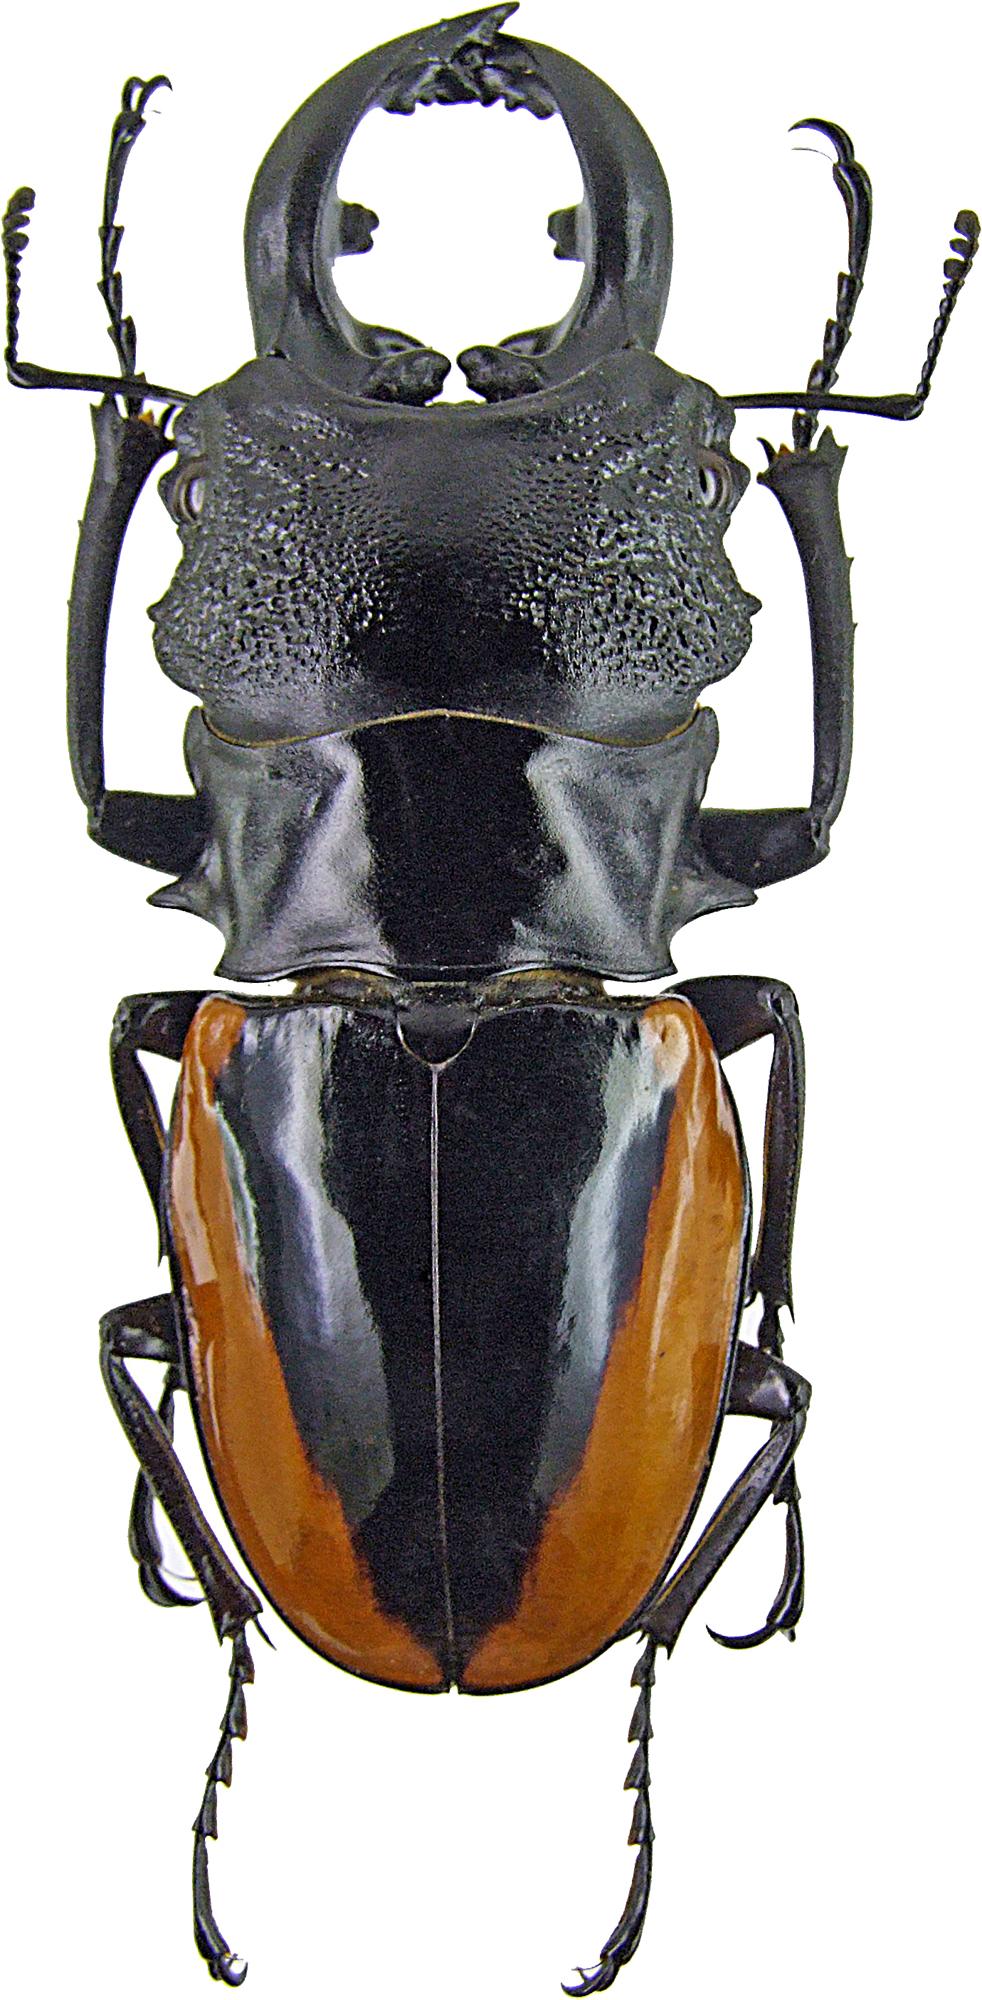 Odontolabis wollastoni 1262.jpg